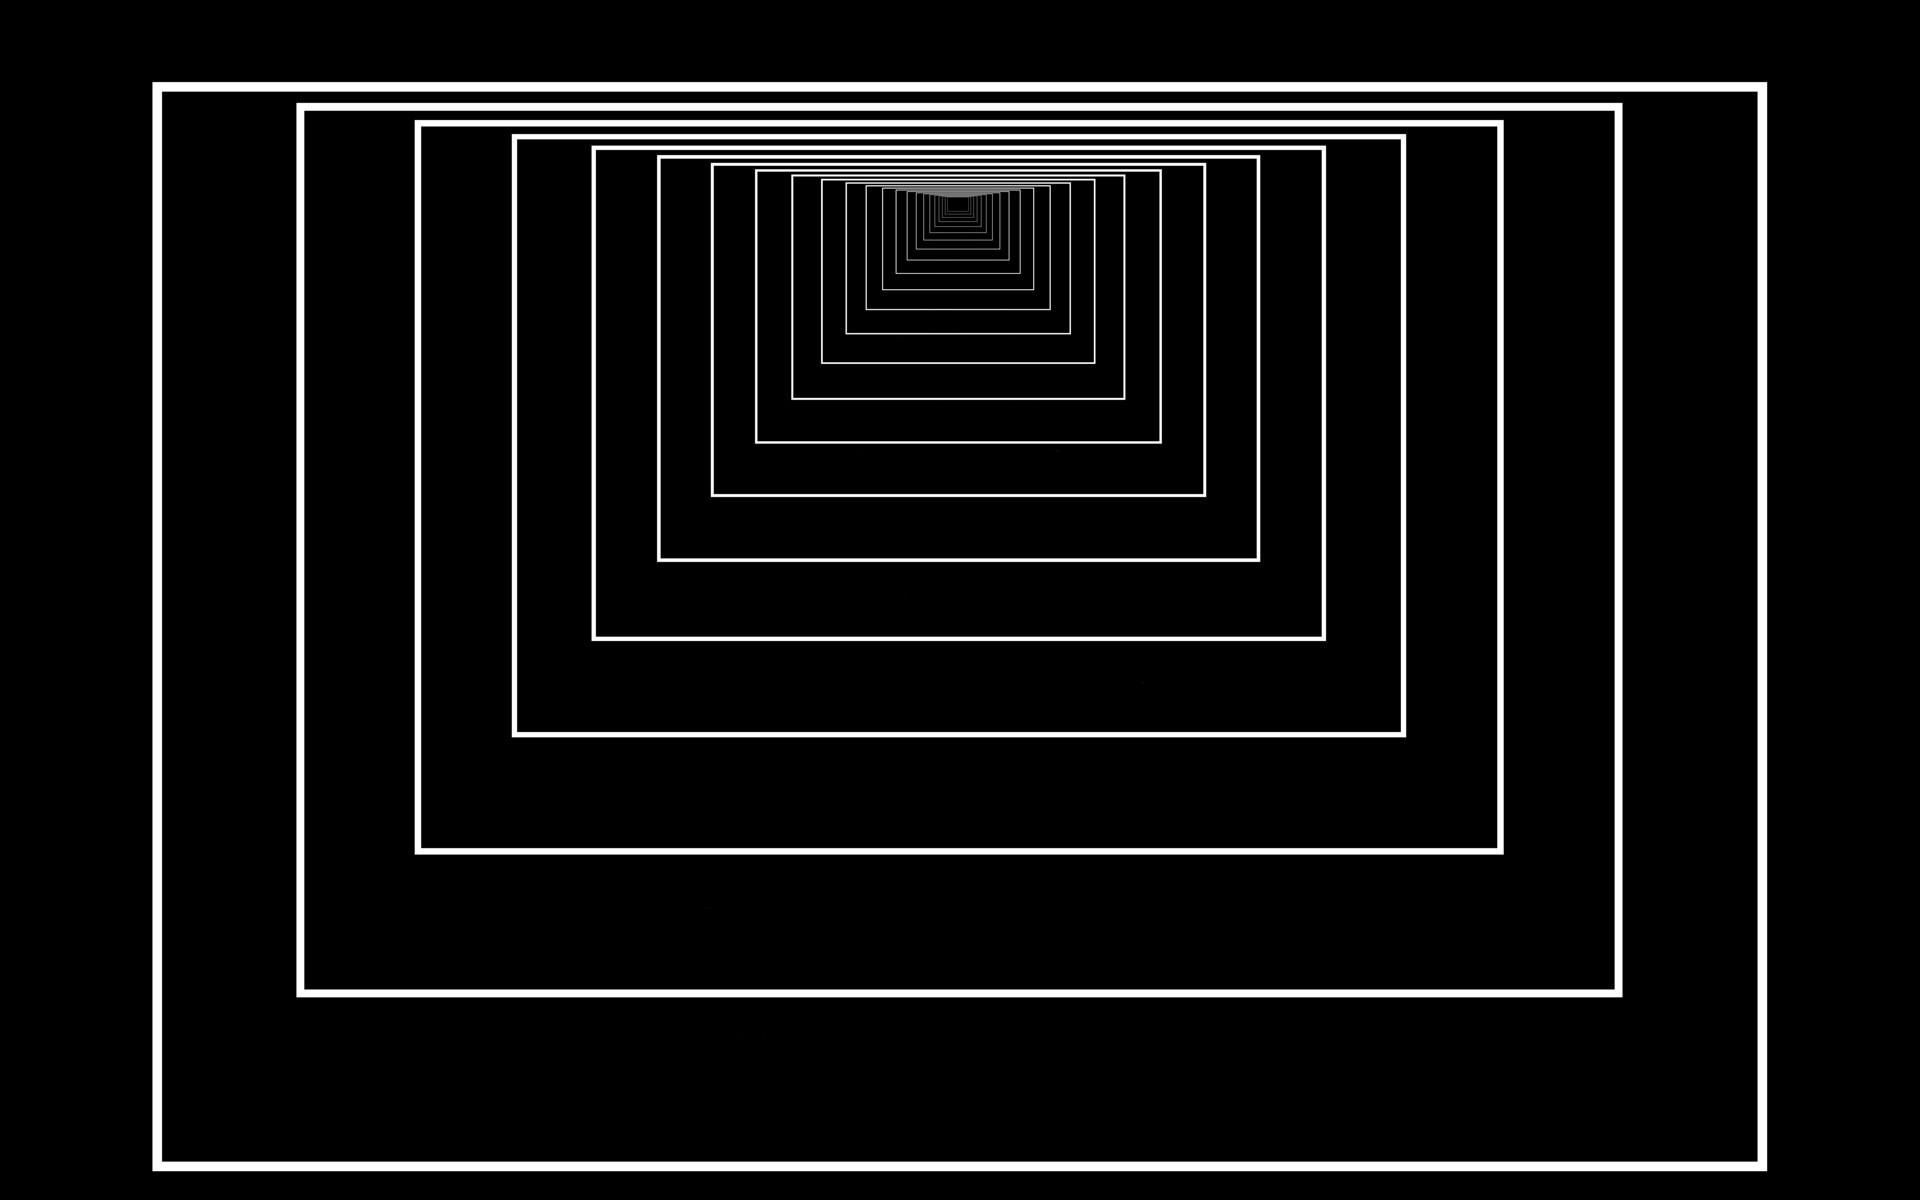 Geometry Wallpaper 7276